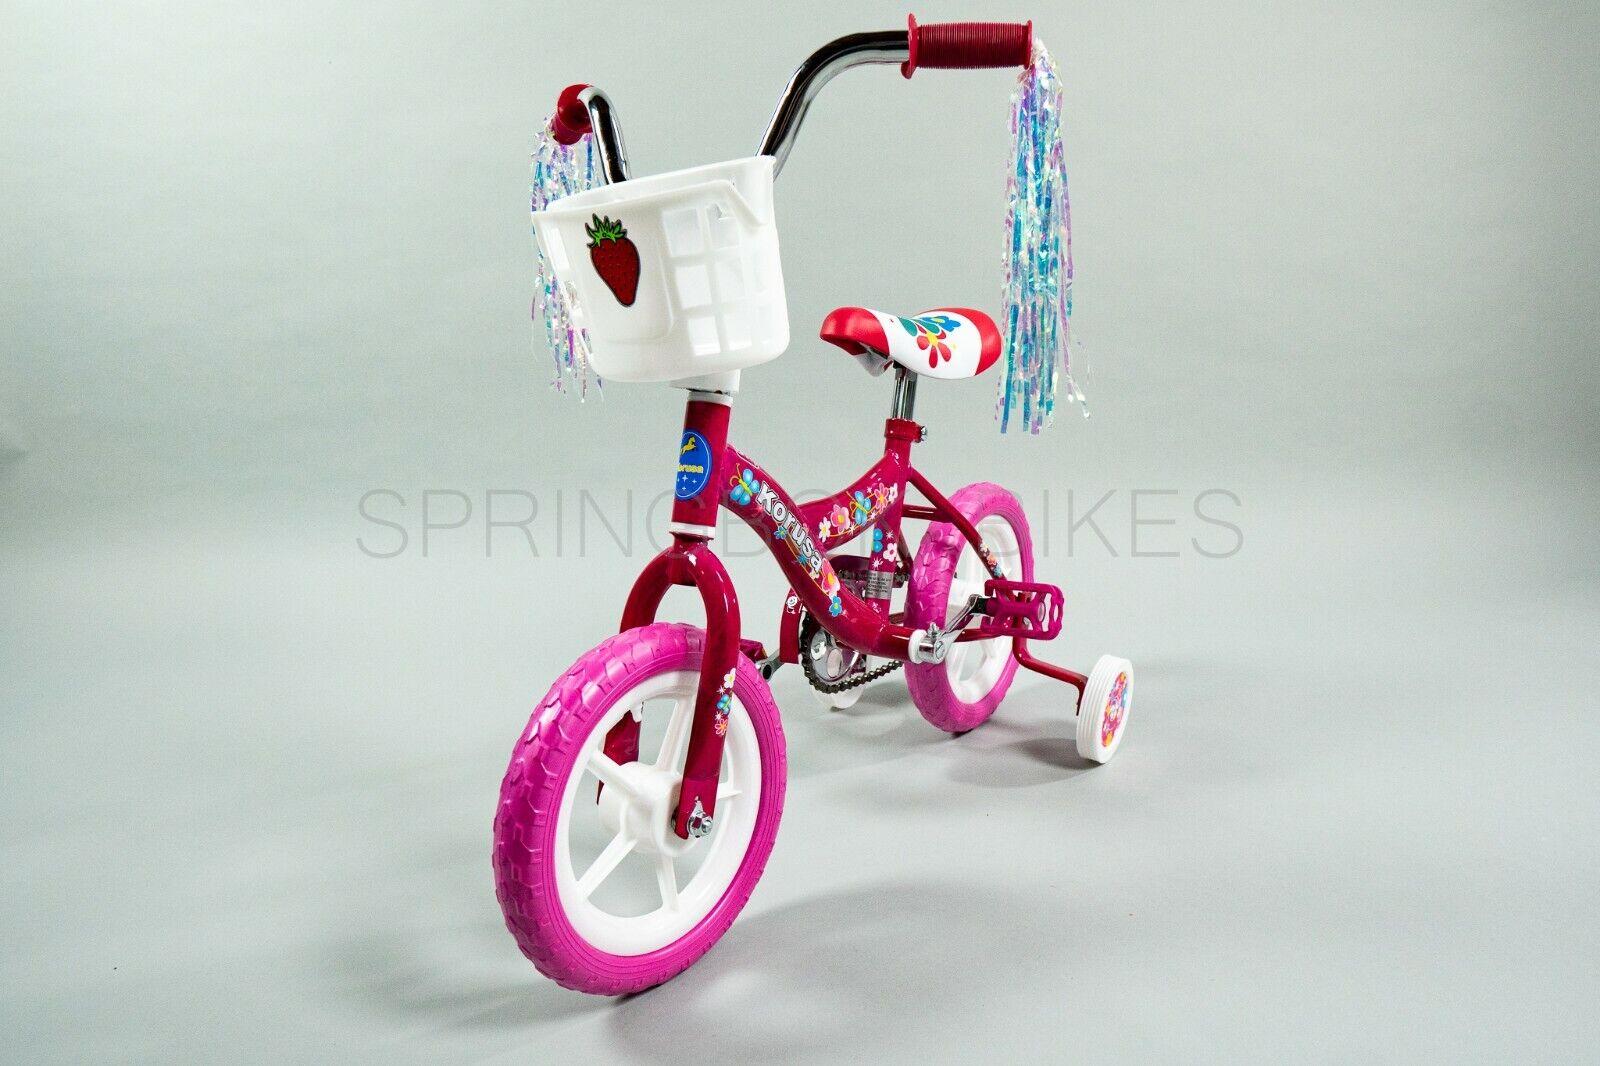 freneci 16-24 inch Kids Bike Training Wheels Boys Girls Cycling Riding Assistant Balance Side Support Wheels